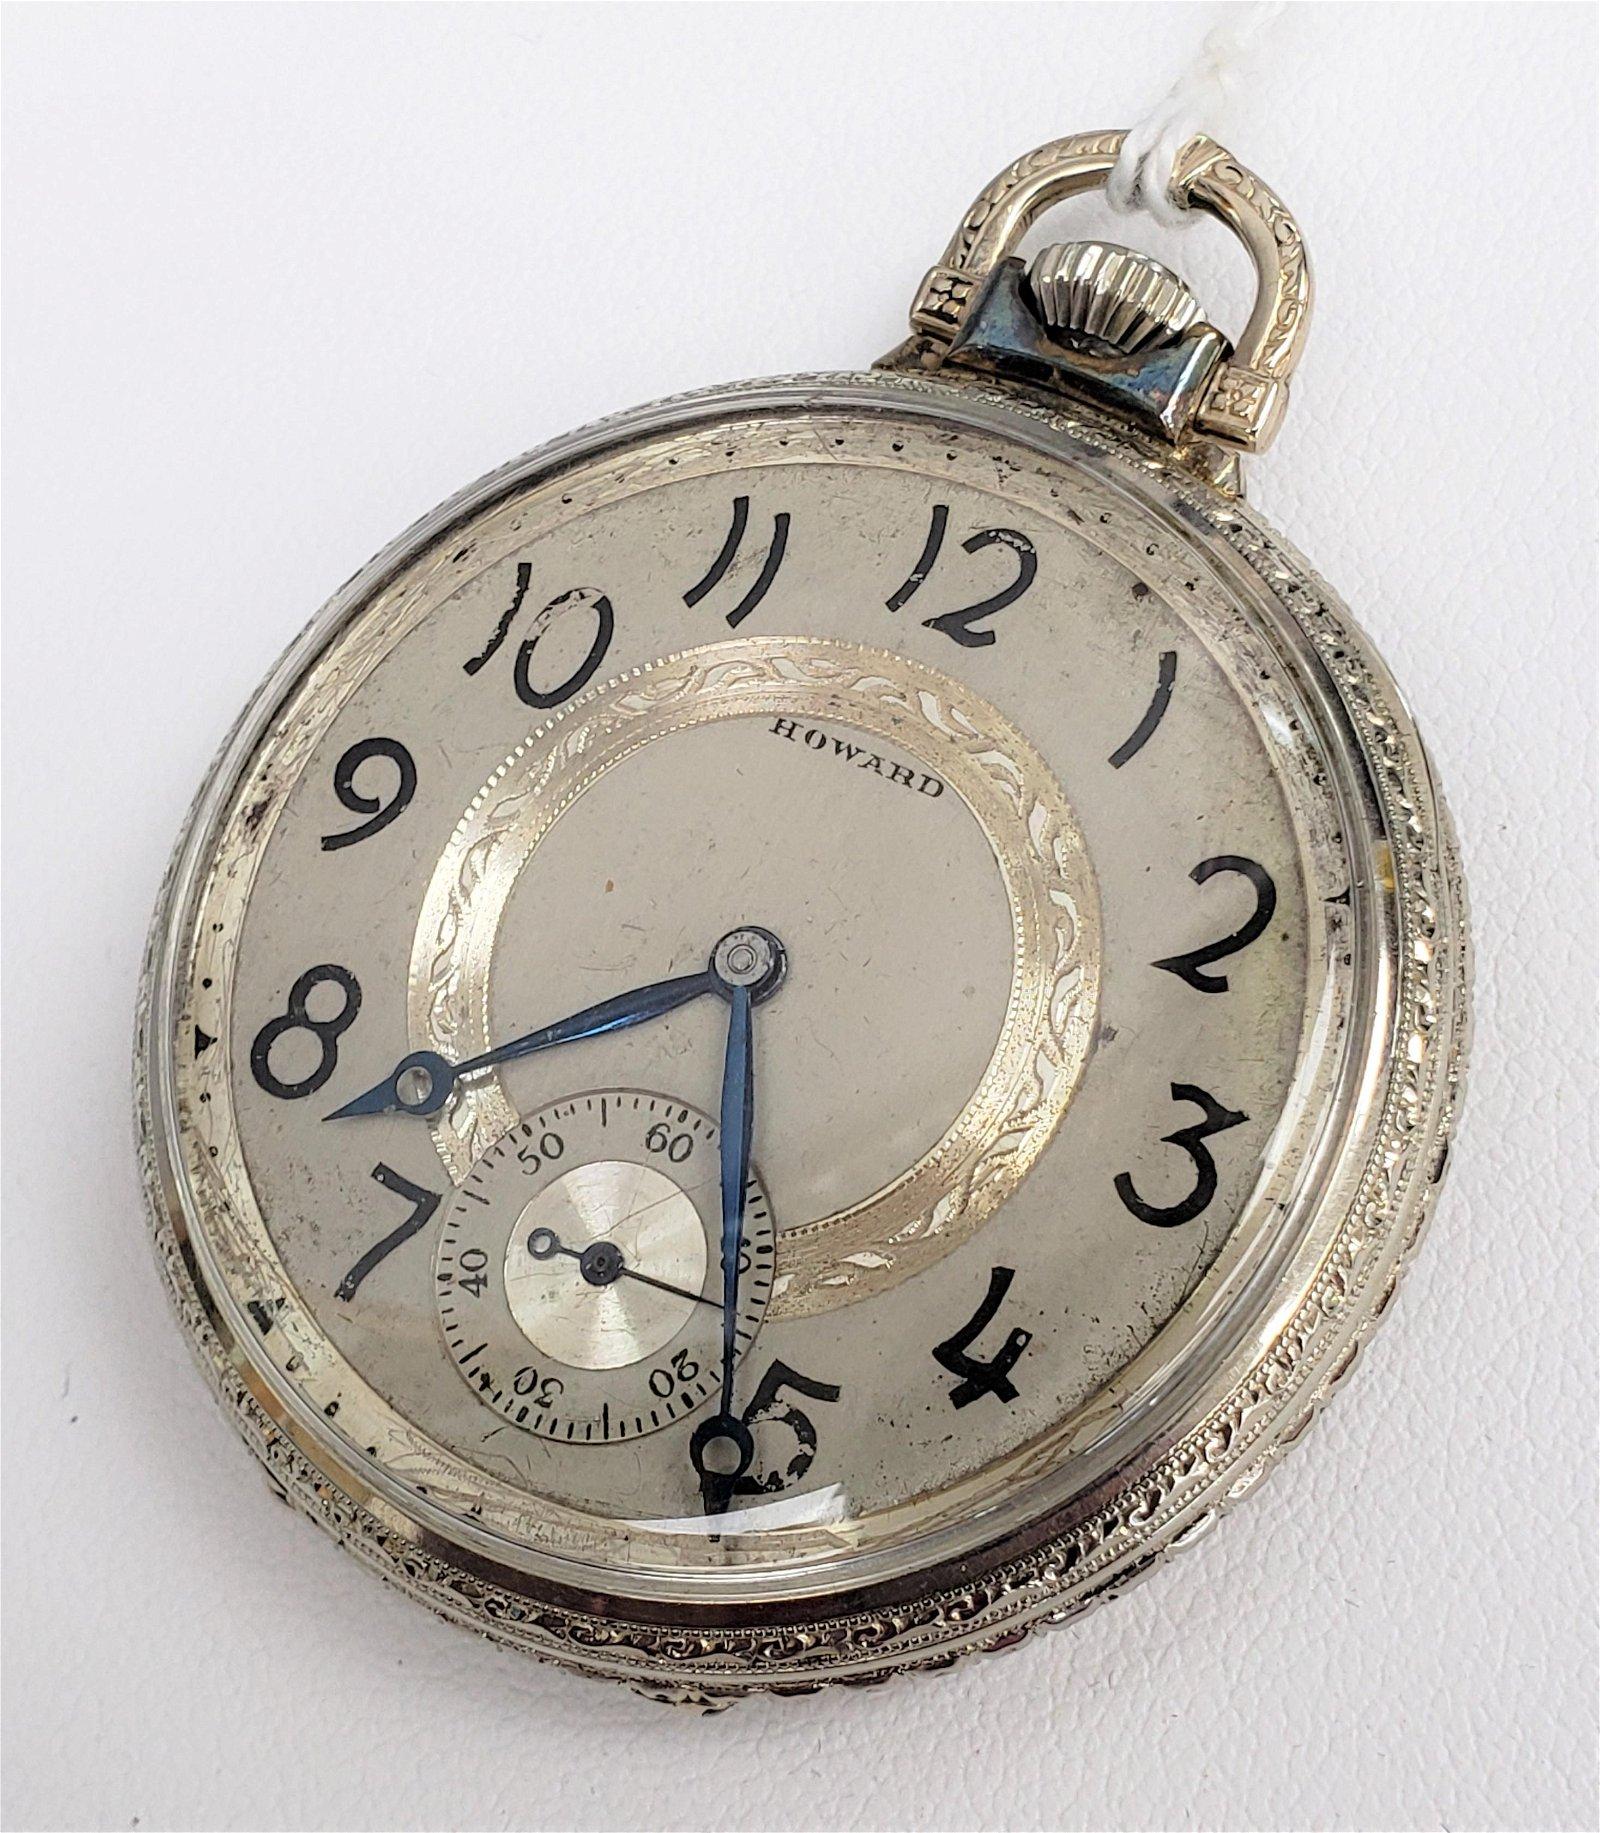 Howard Vintage Pocket watch